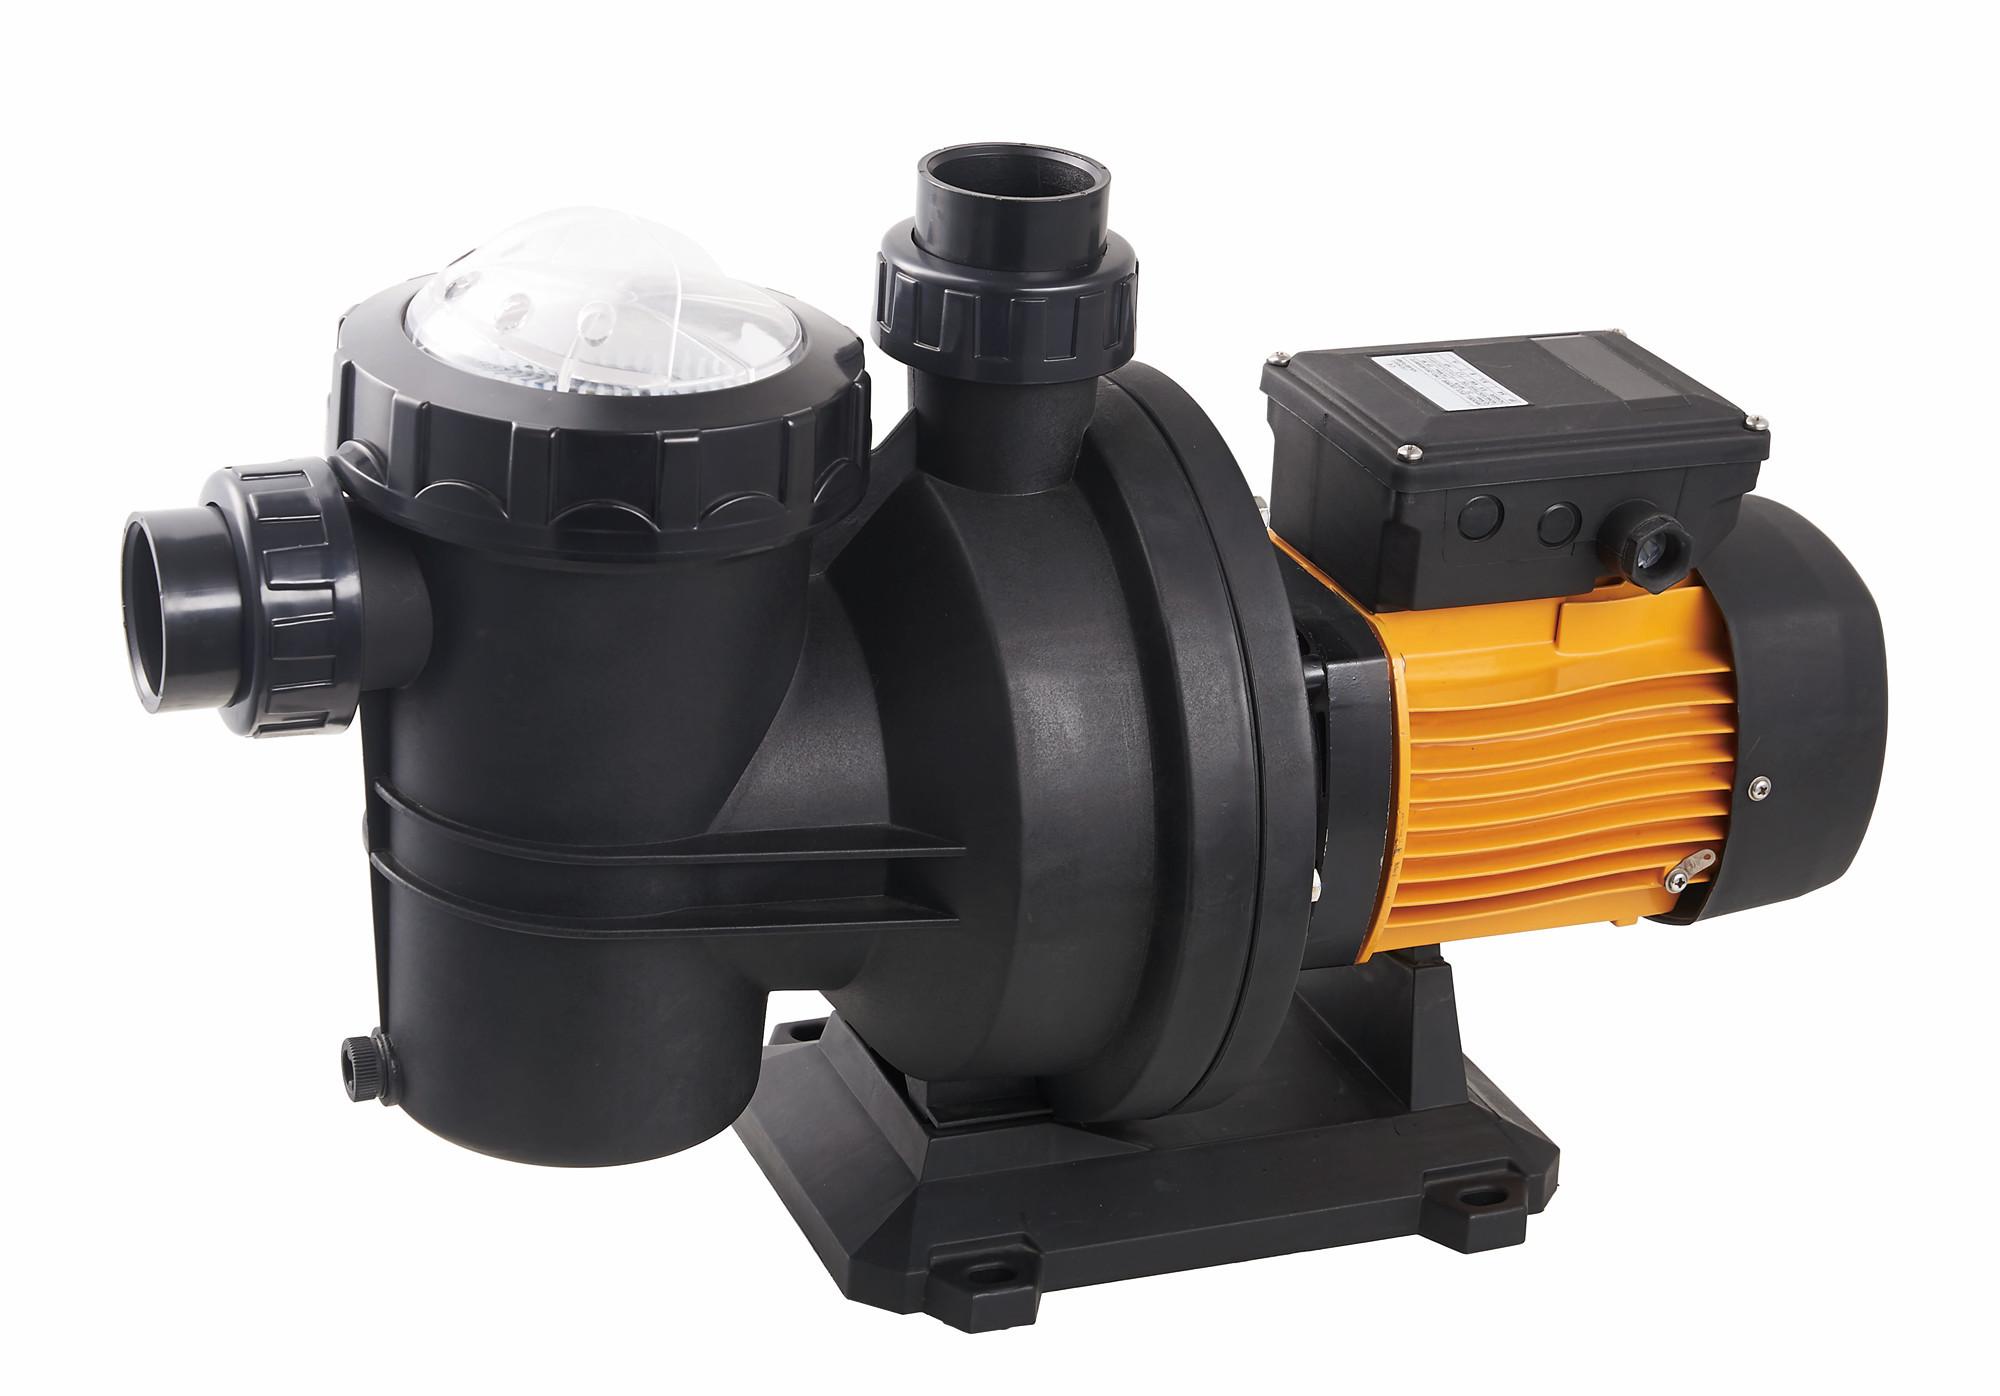 DC 900w pool solar pump